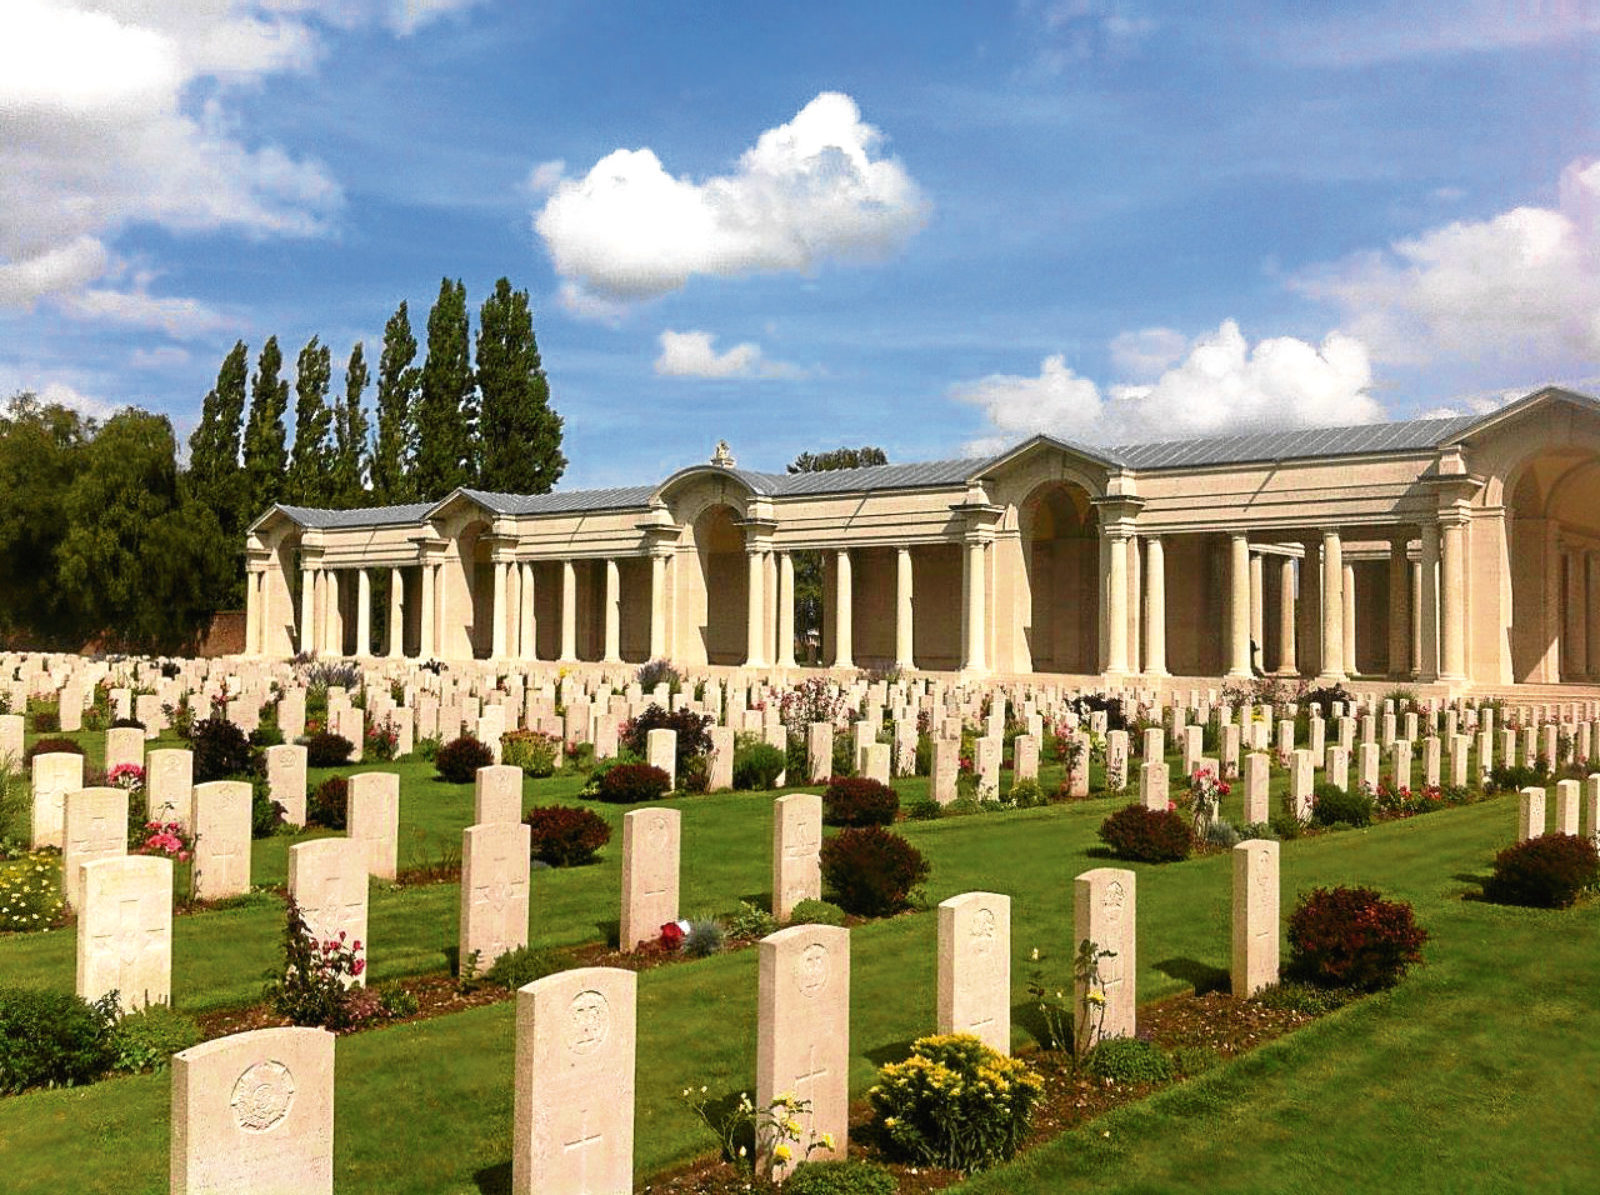 The Arras Memorial in France